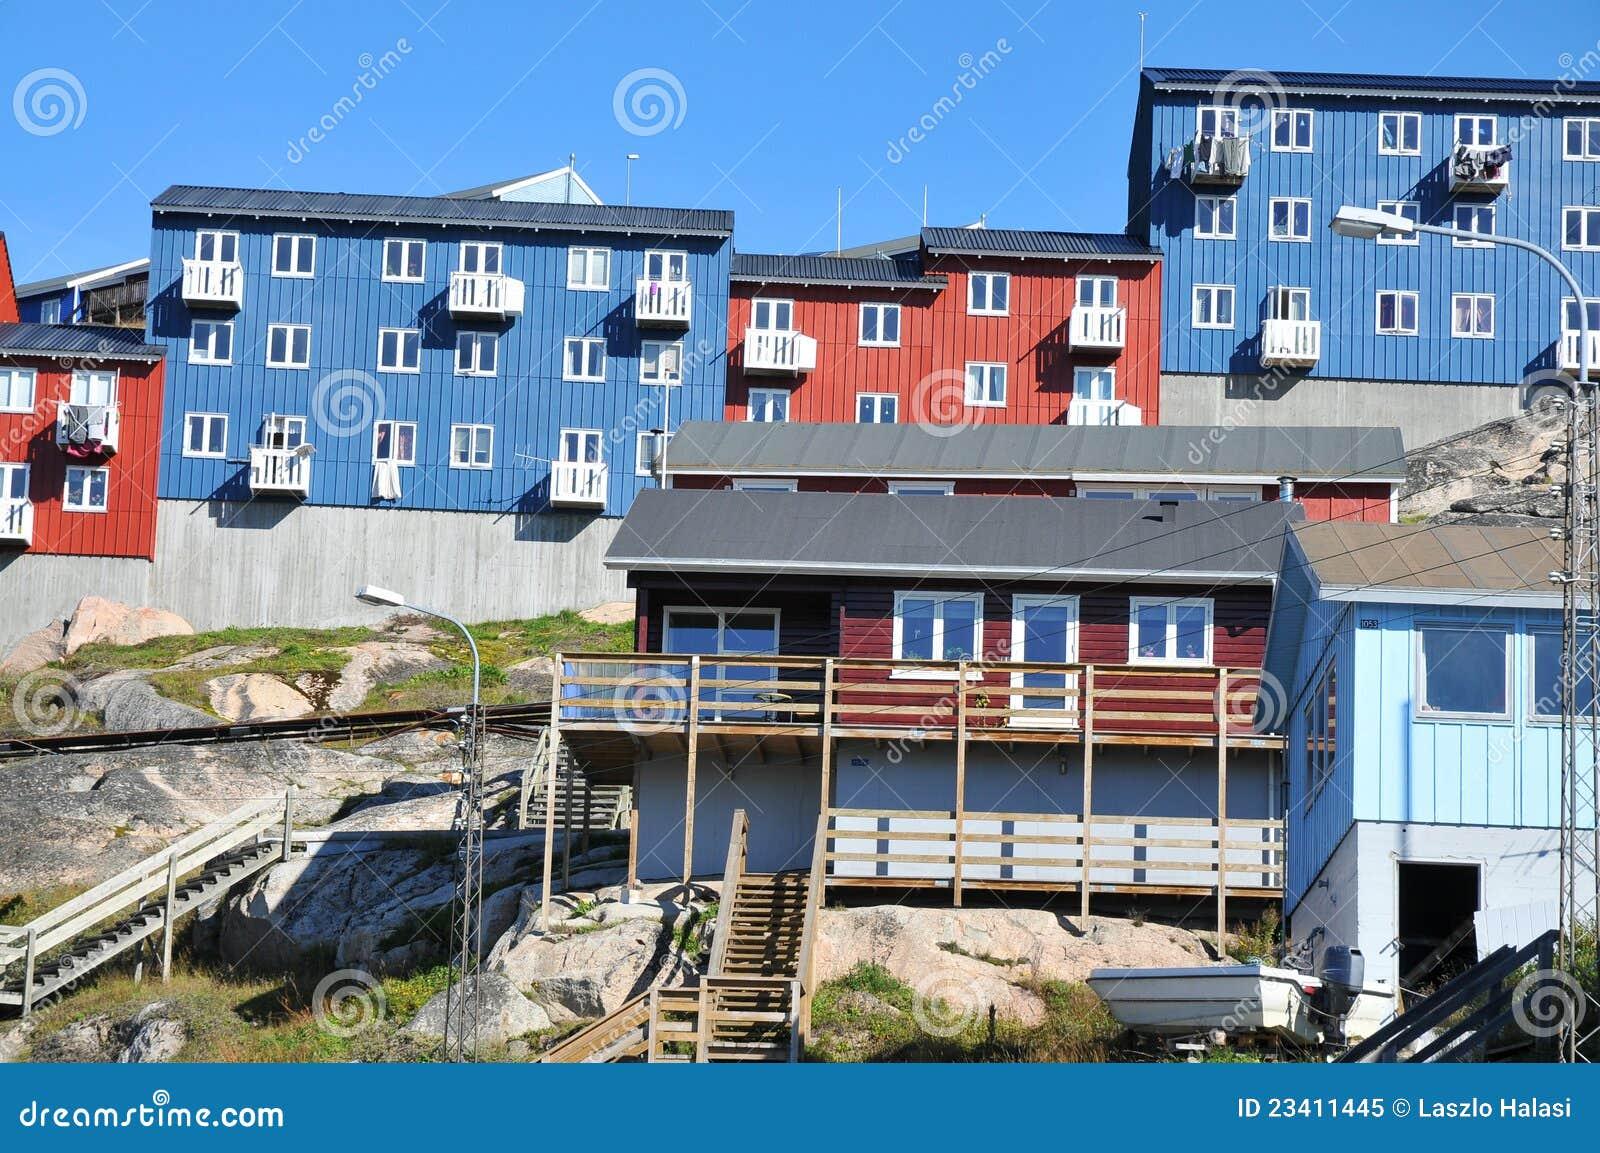 Kleurrijke huizen, gebouwen in Qaqortoq, Groenland